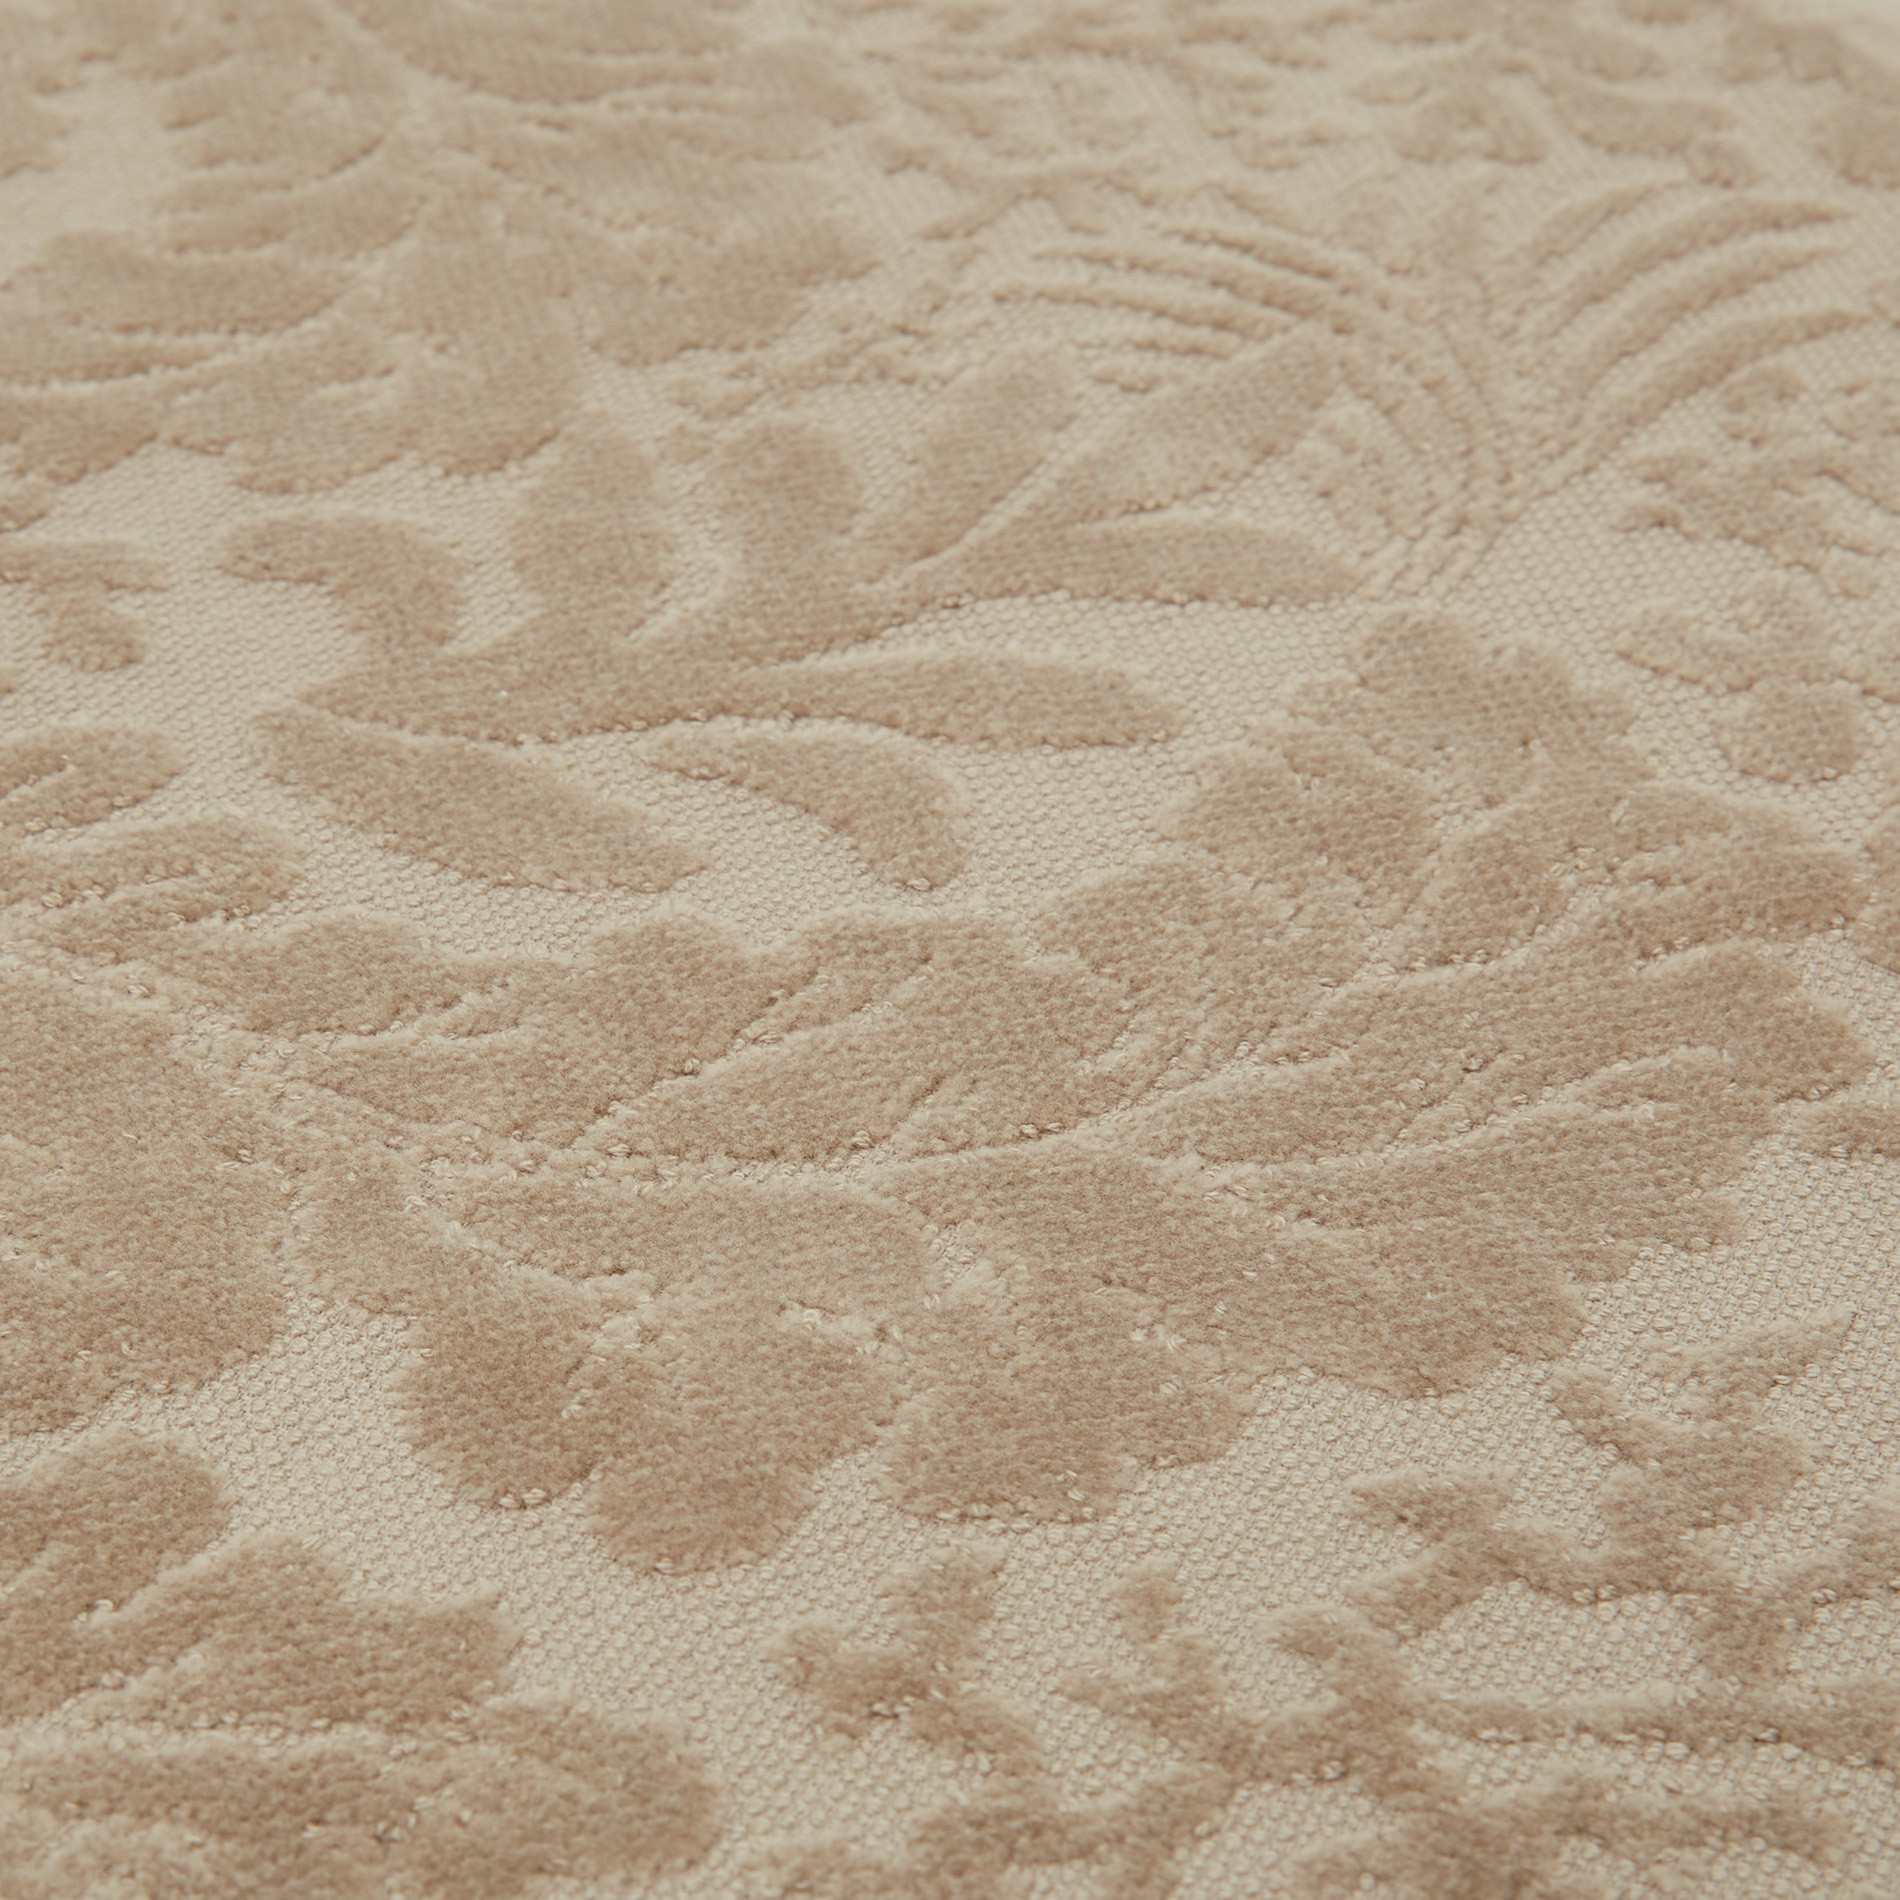 Asciugamano cotone velour motivo coralli, Beige, large image number 2